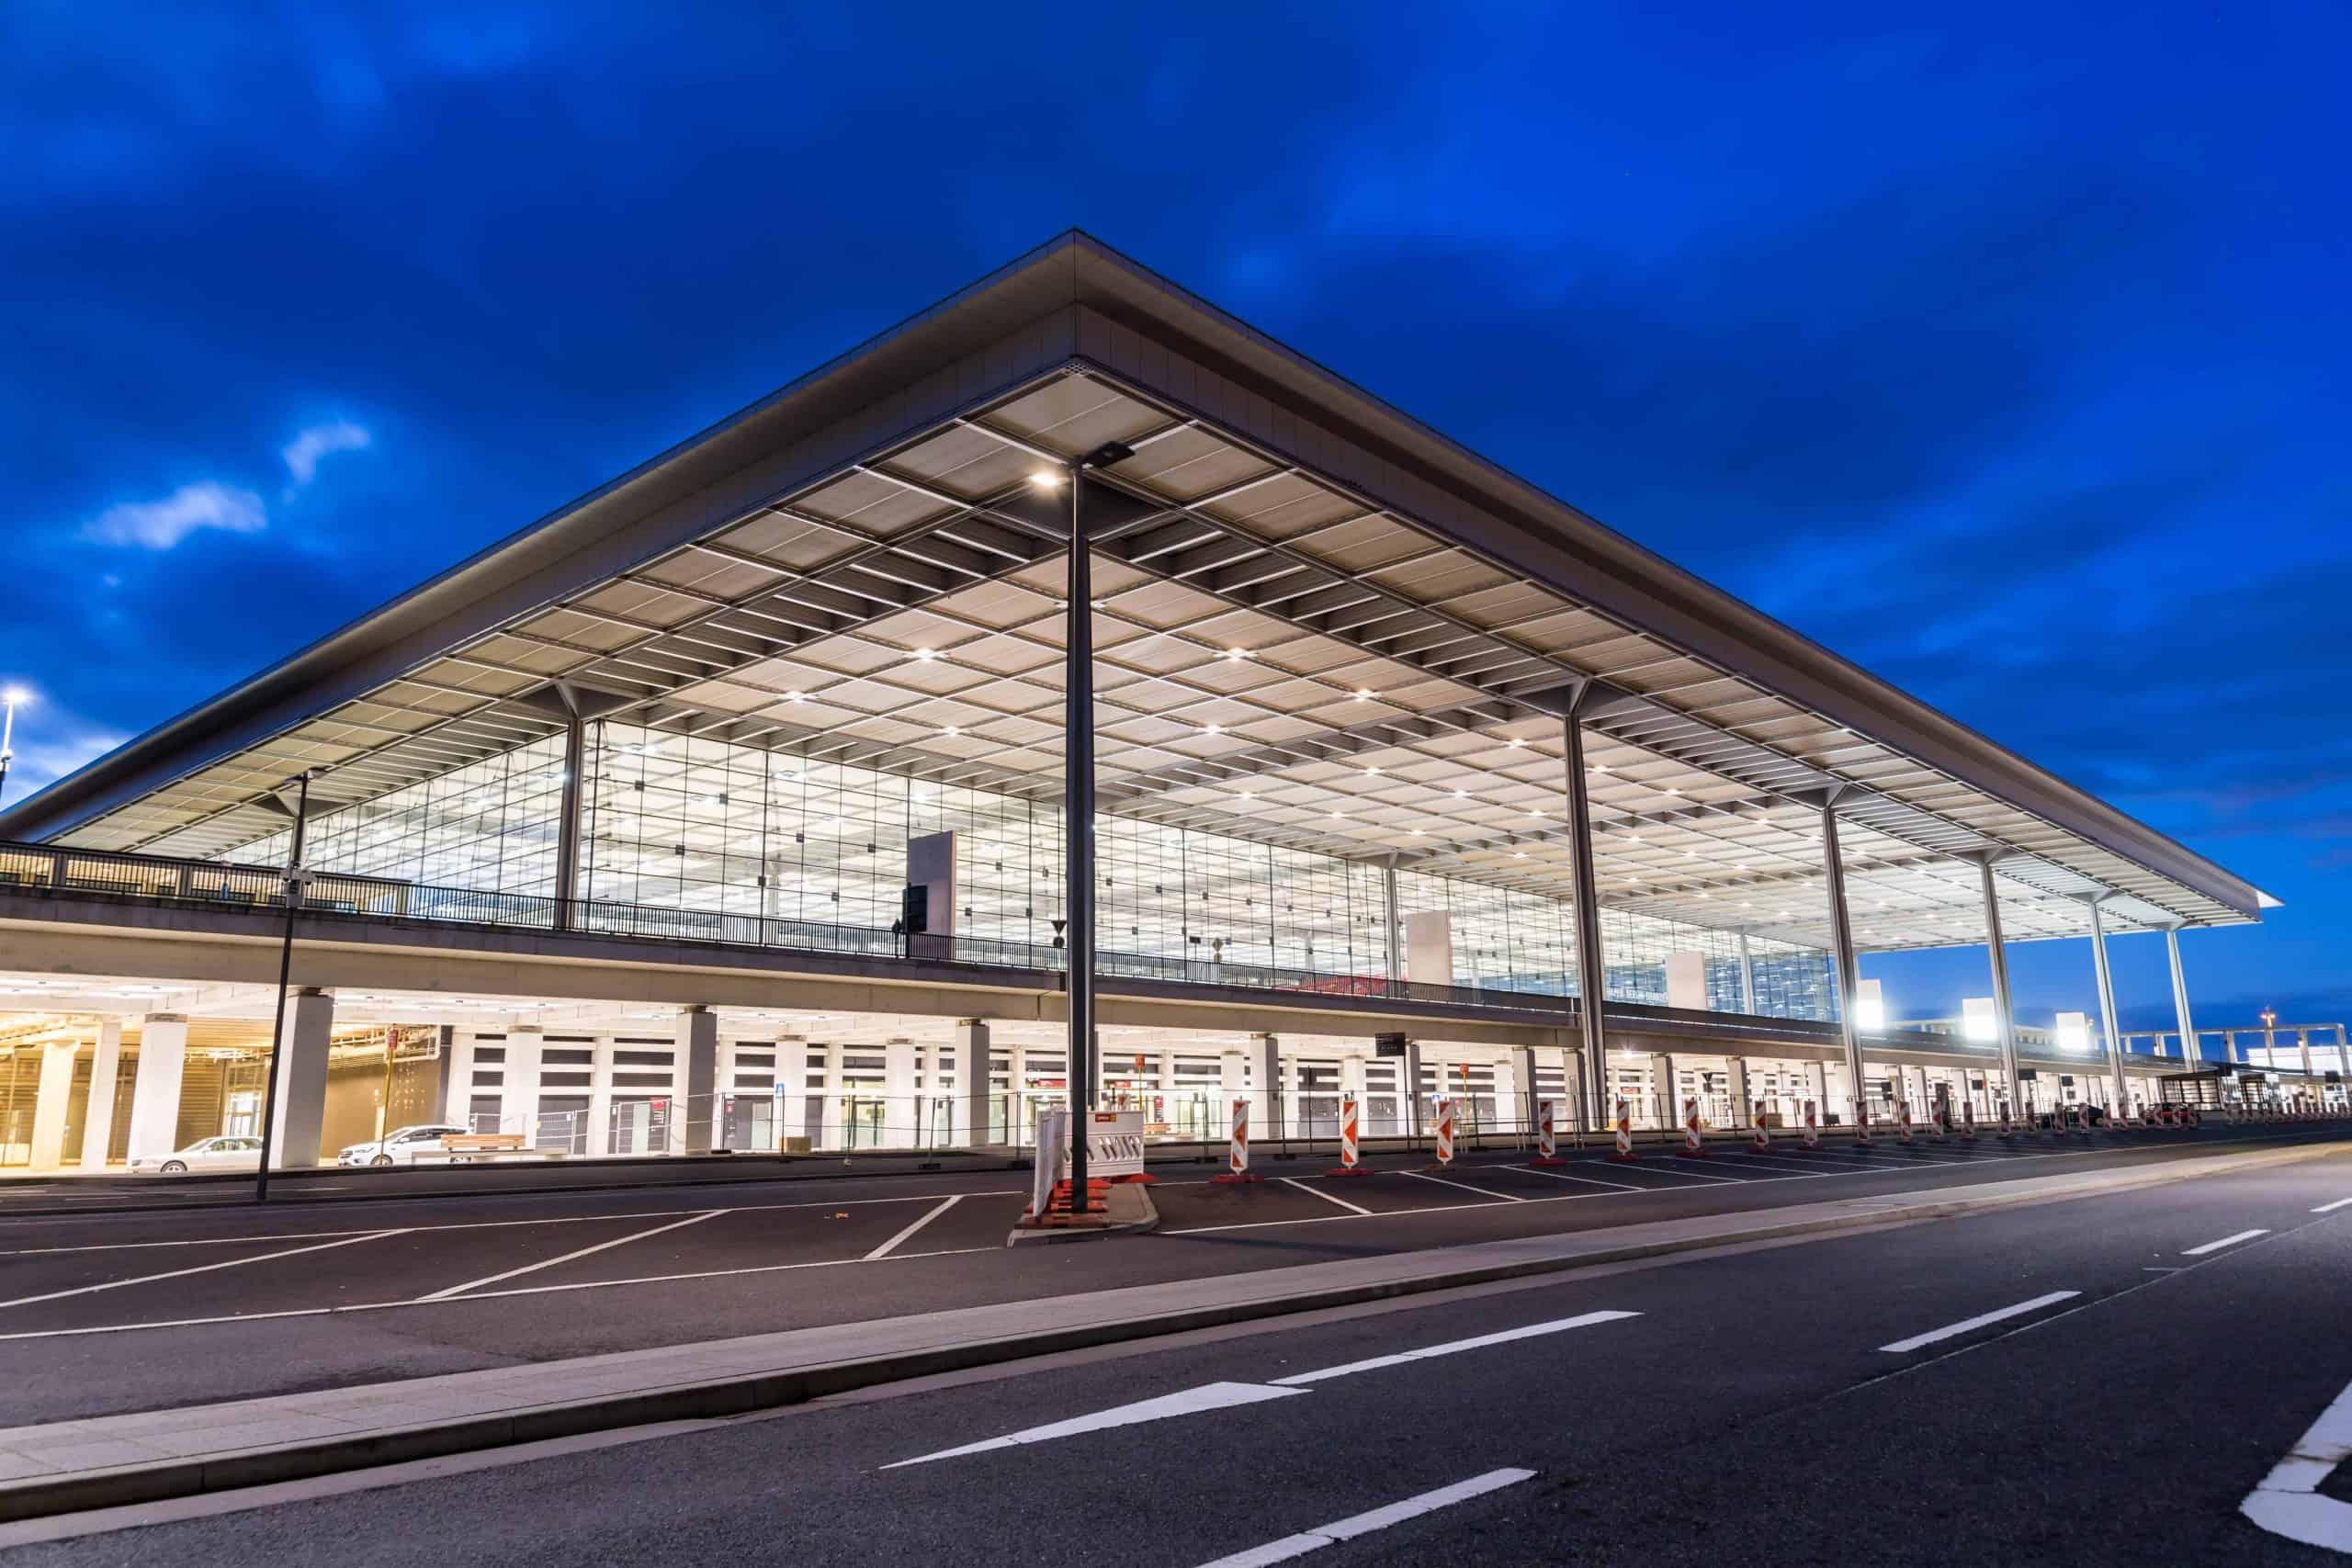 Airport Frankfurt Ankunft Heute